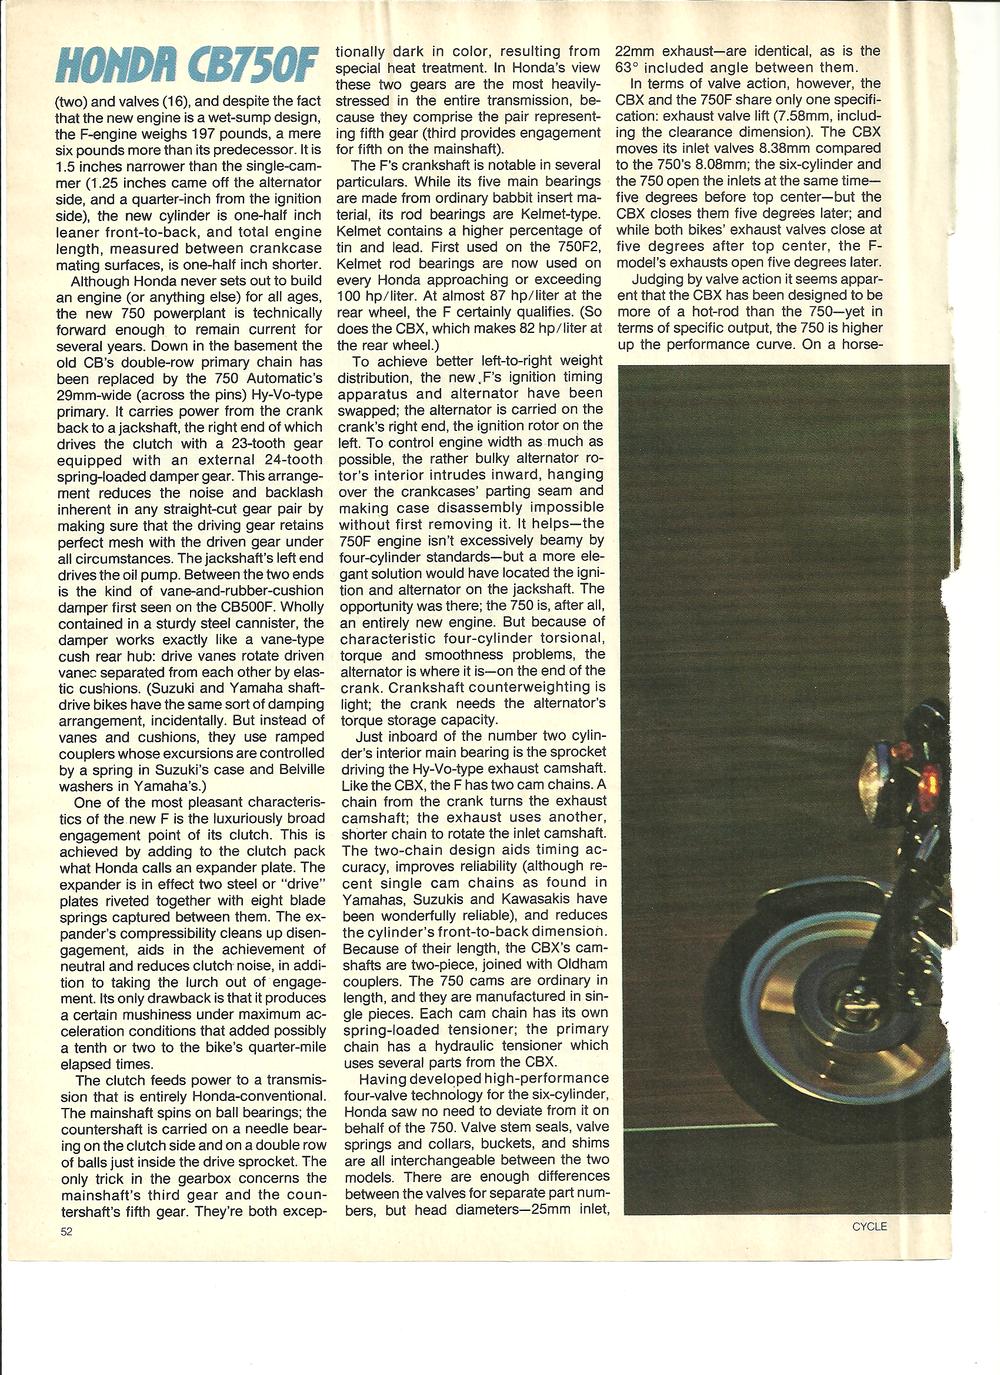 1979_Honda_CB750F_test_pg3.png